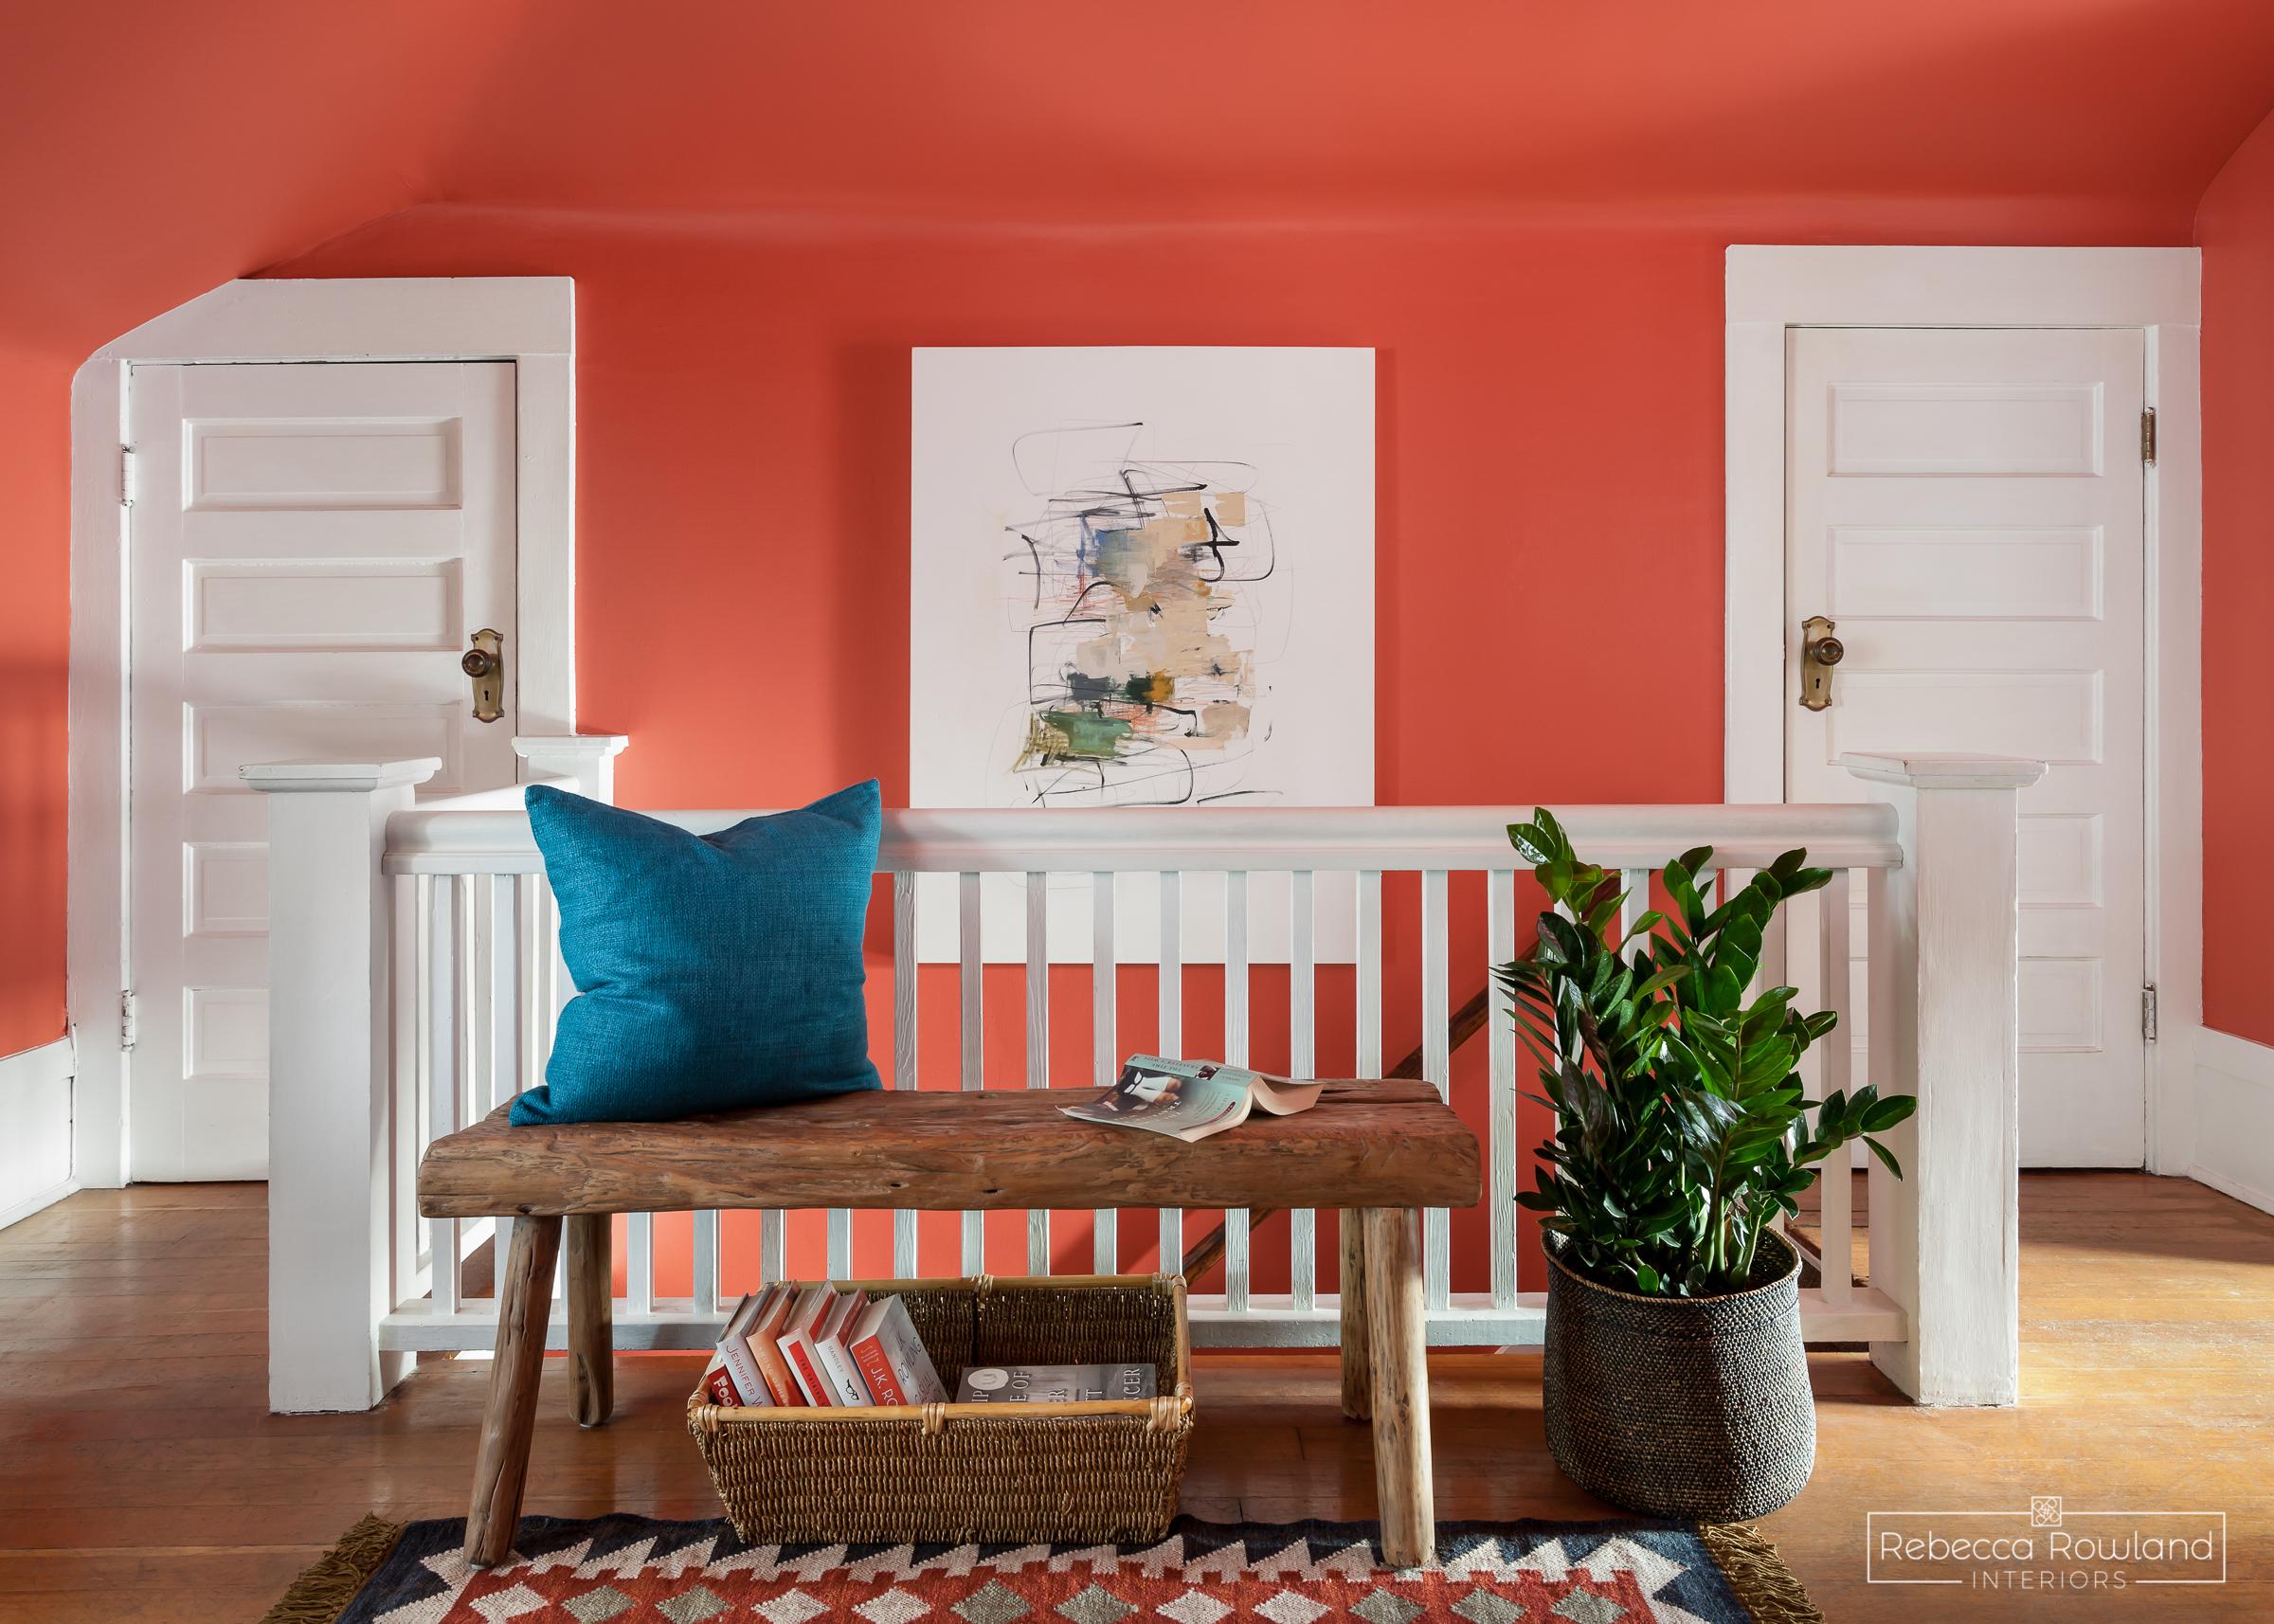 Rebecca Rowland Interiors _Roosevelt_Craftsman_Seattle_Interior_design_stair_landing_coral